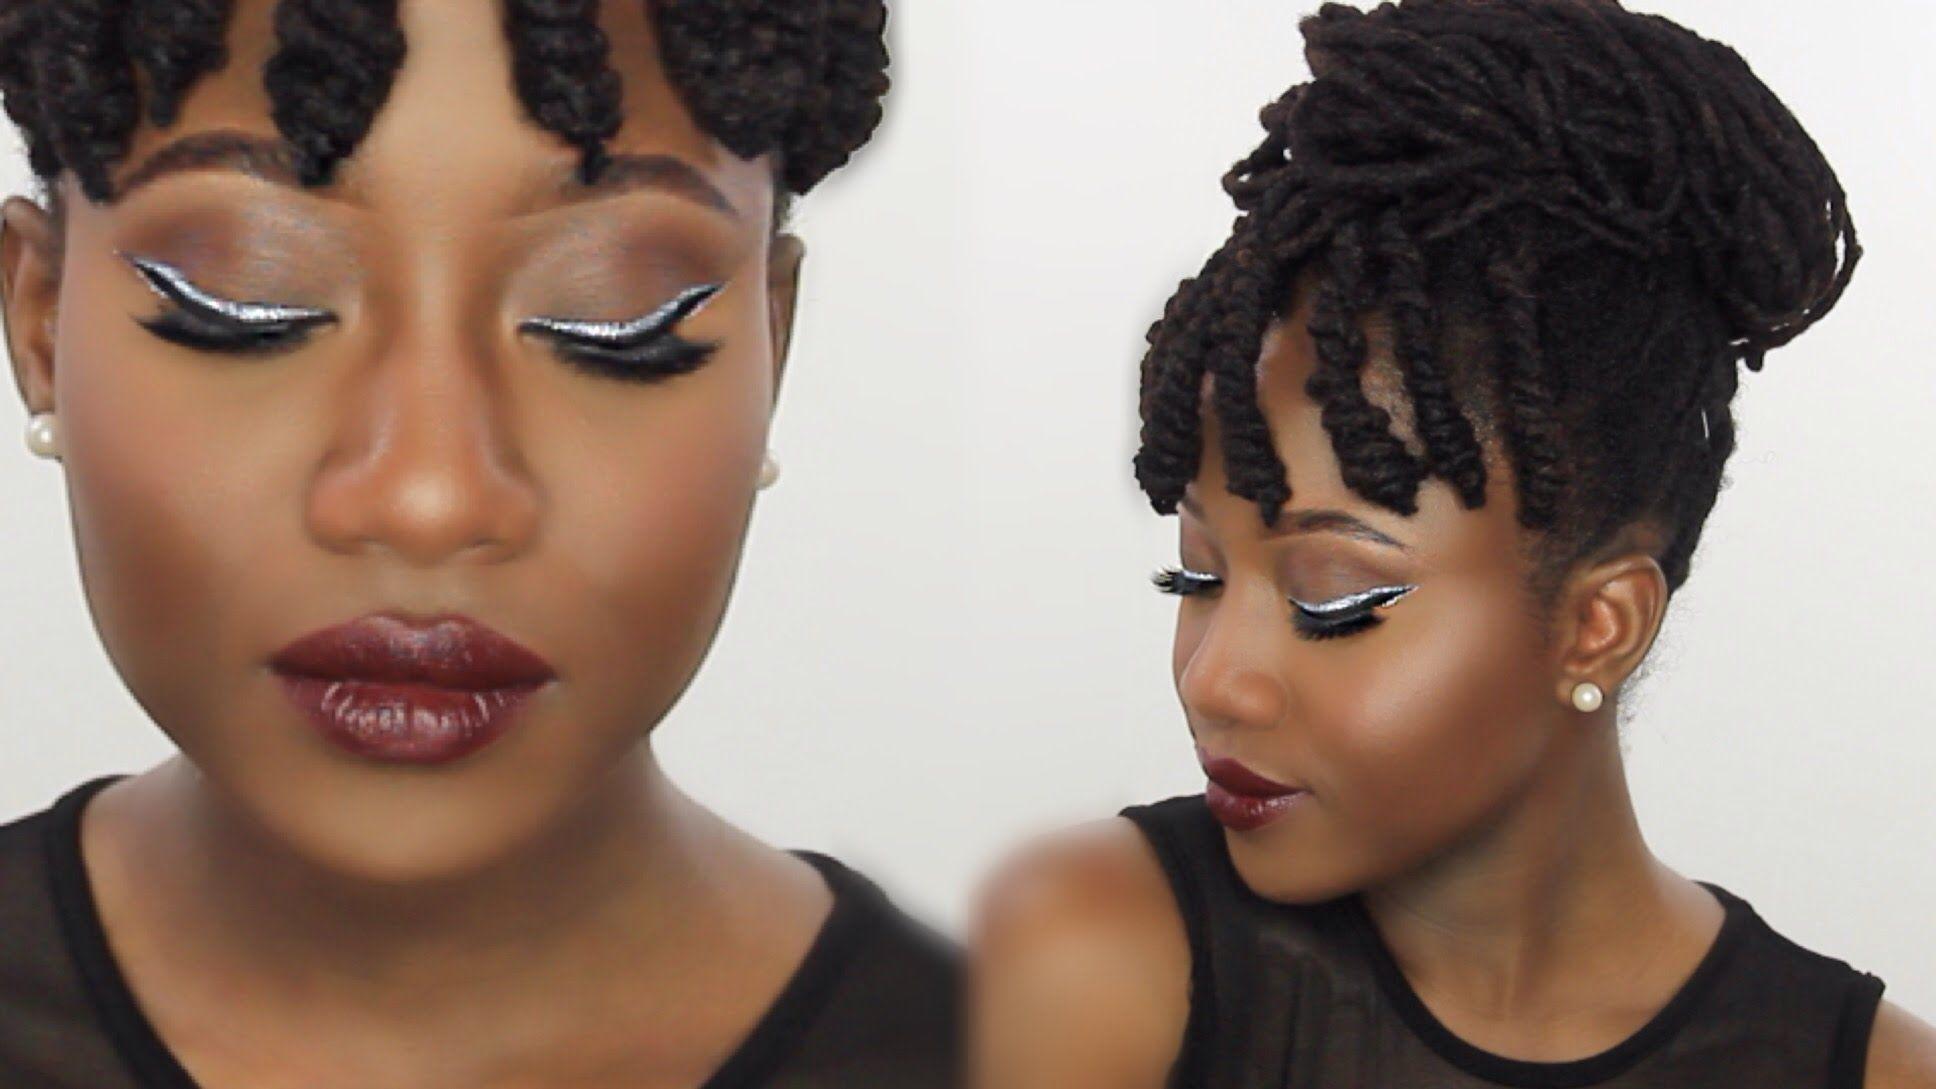 GLITTER GLAM MAKEUP TUTORIAL JASMINE ROSE how to black